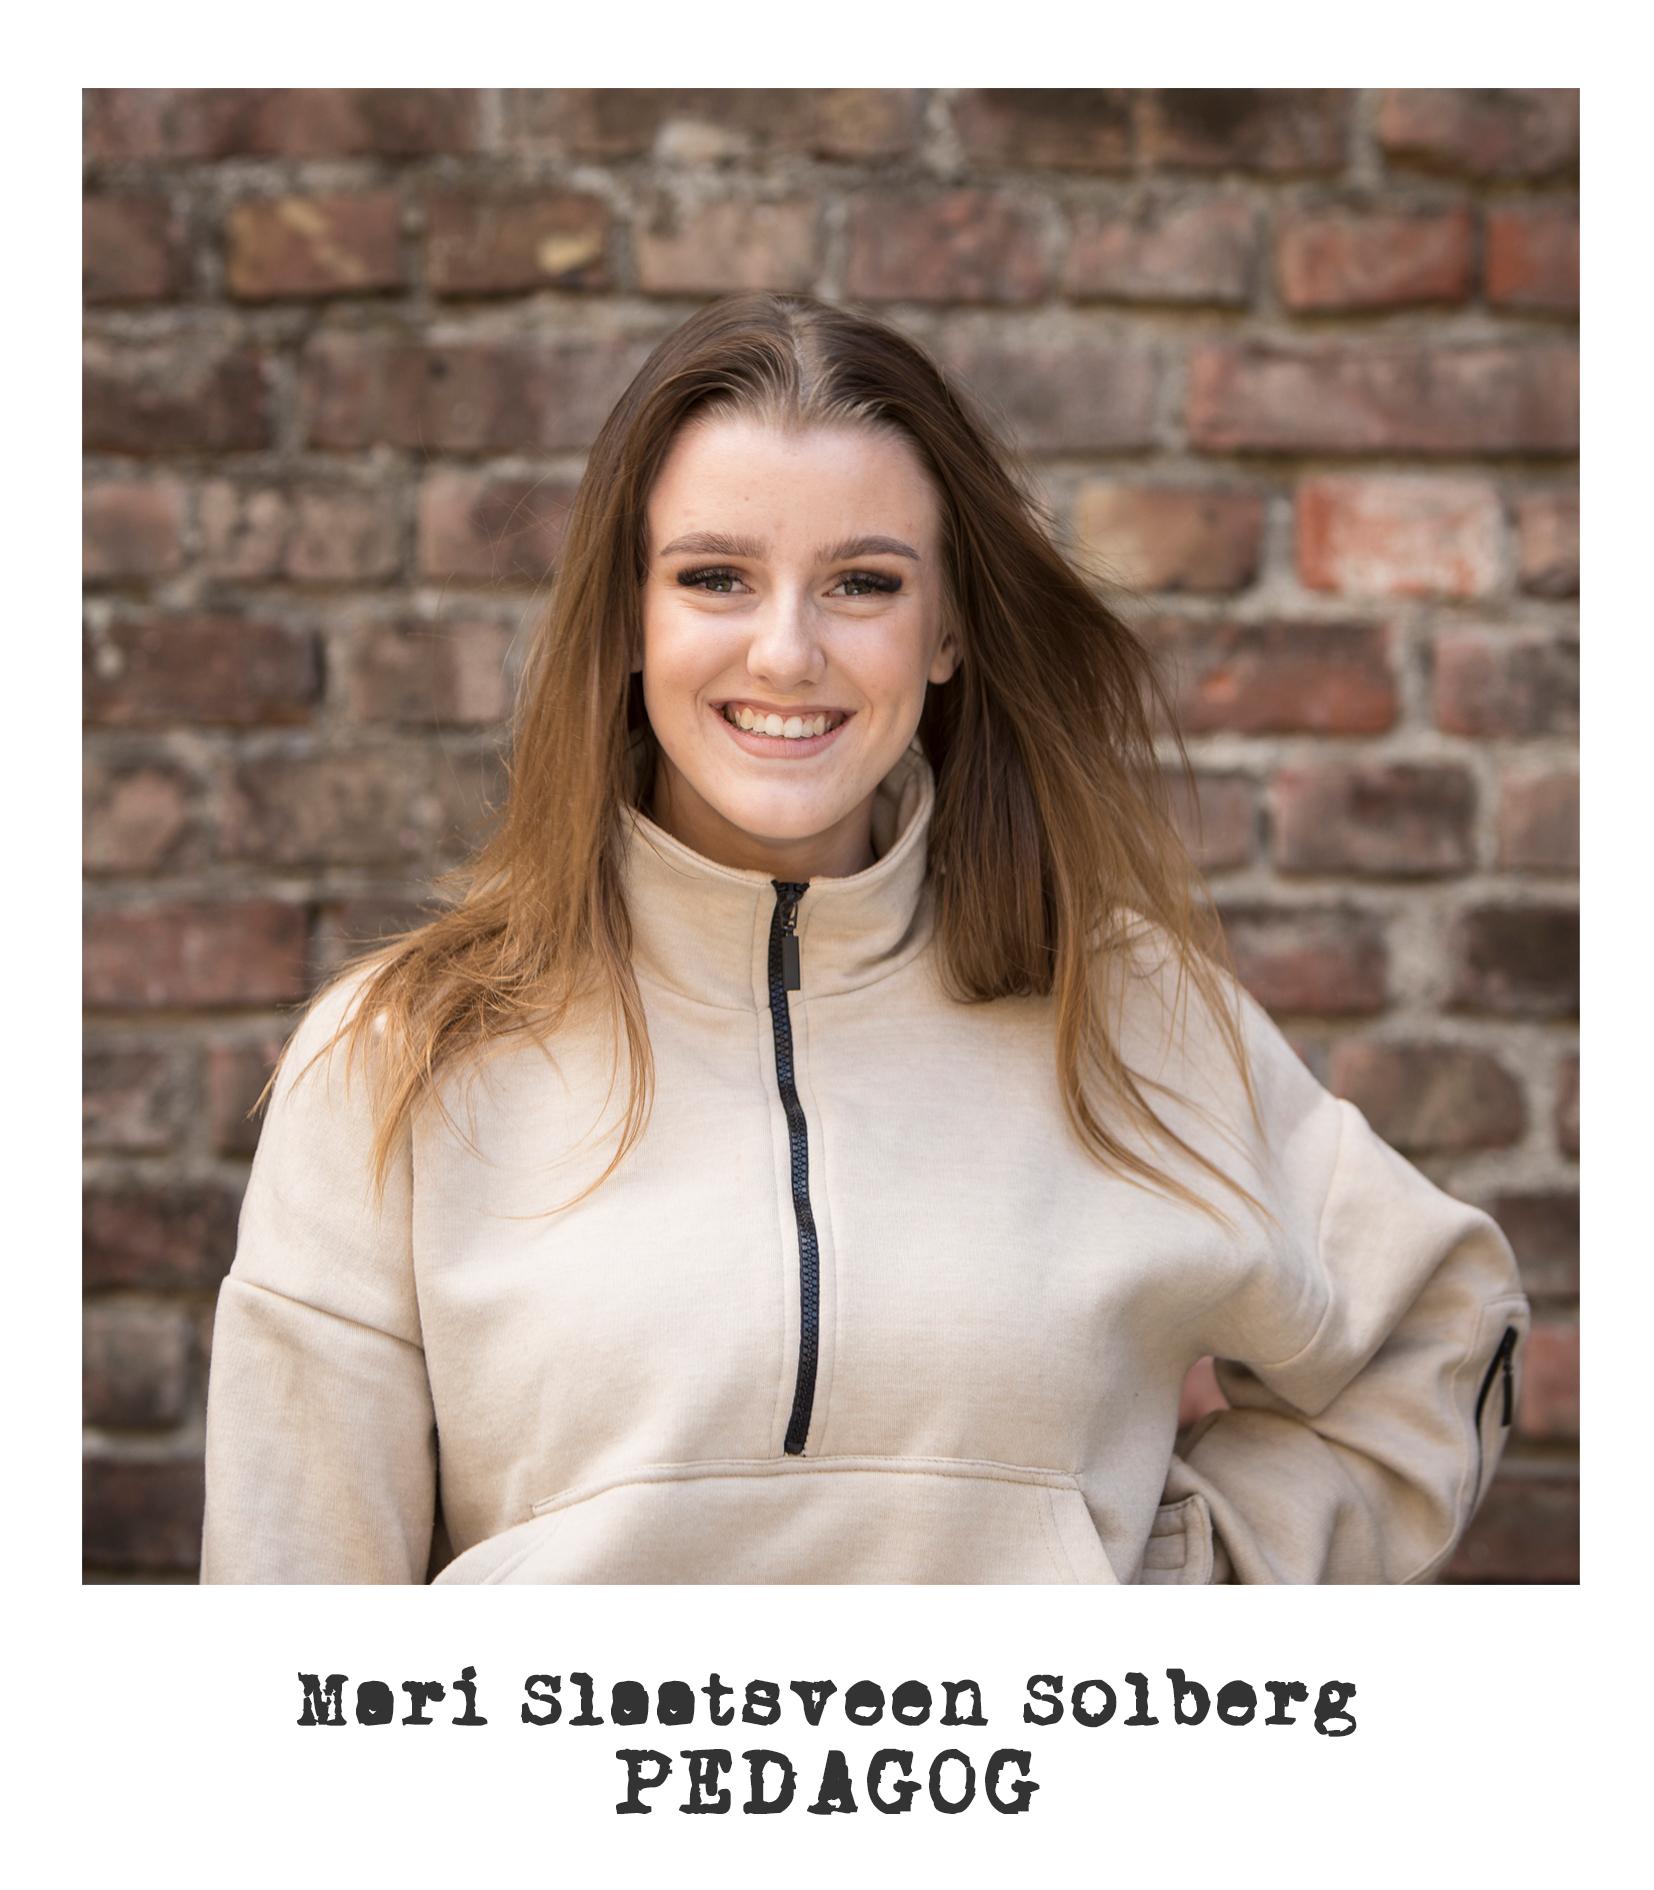 Mari Slaatsveen Solberg